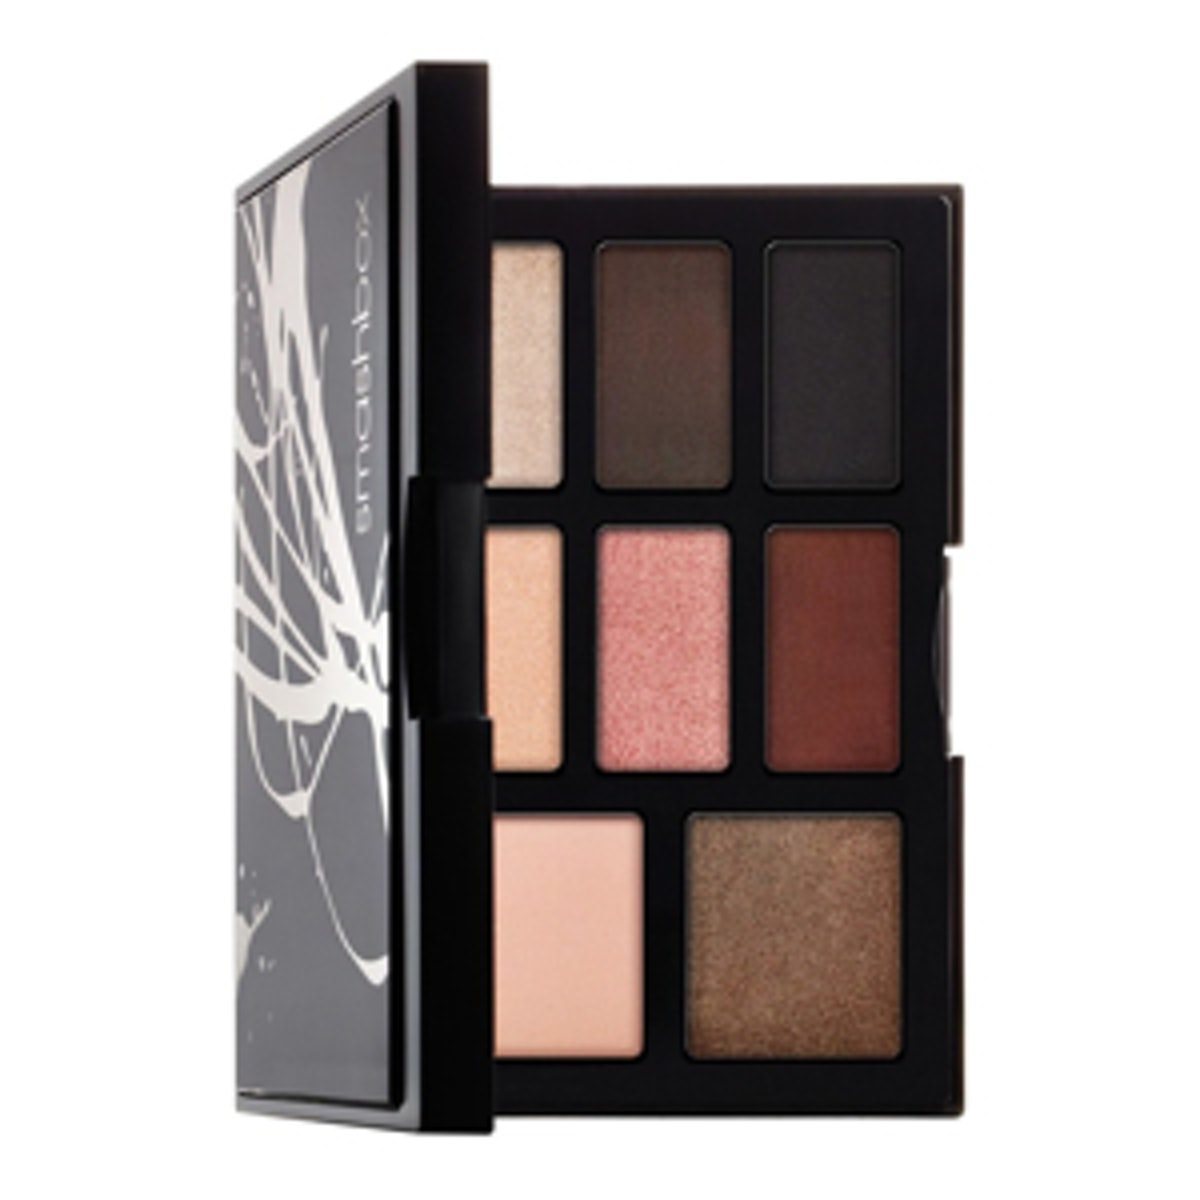 Photo Op Cherry Smoke Eyeshadow Palette